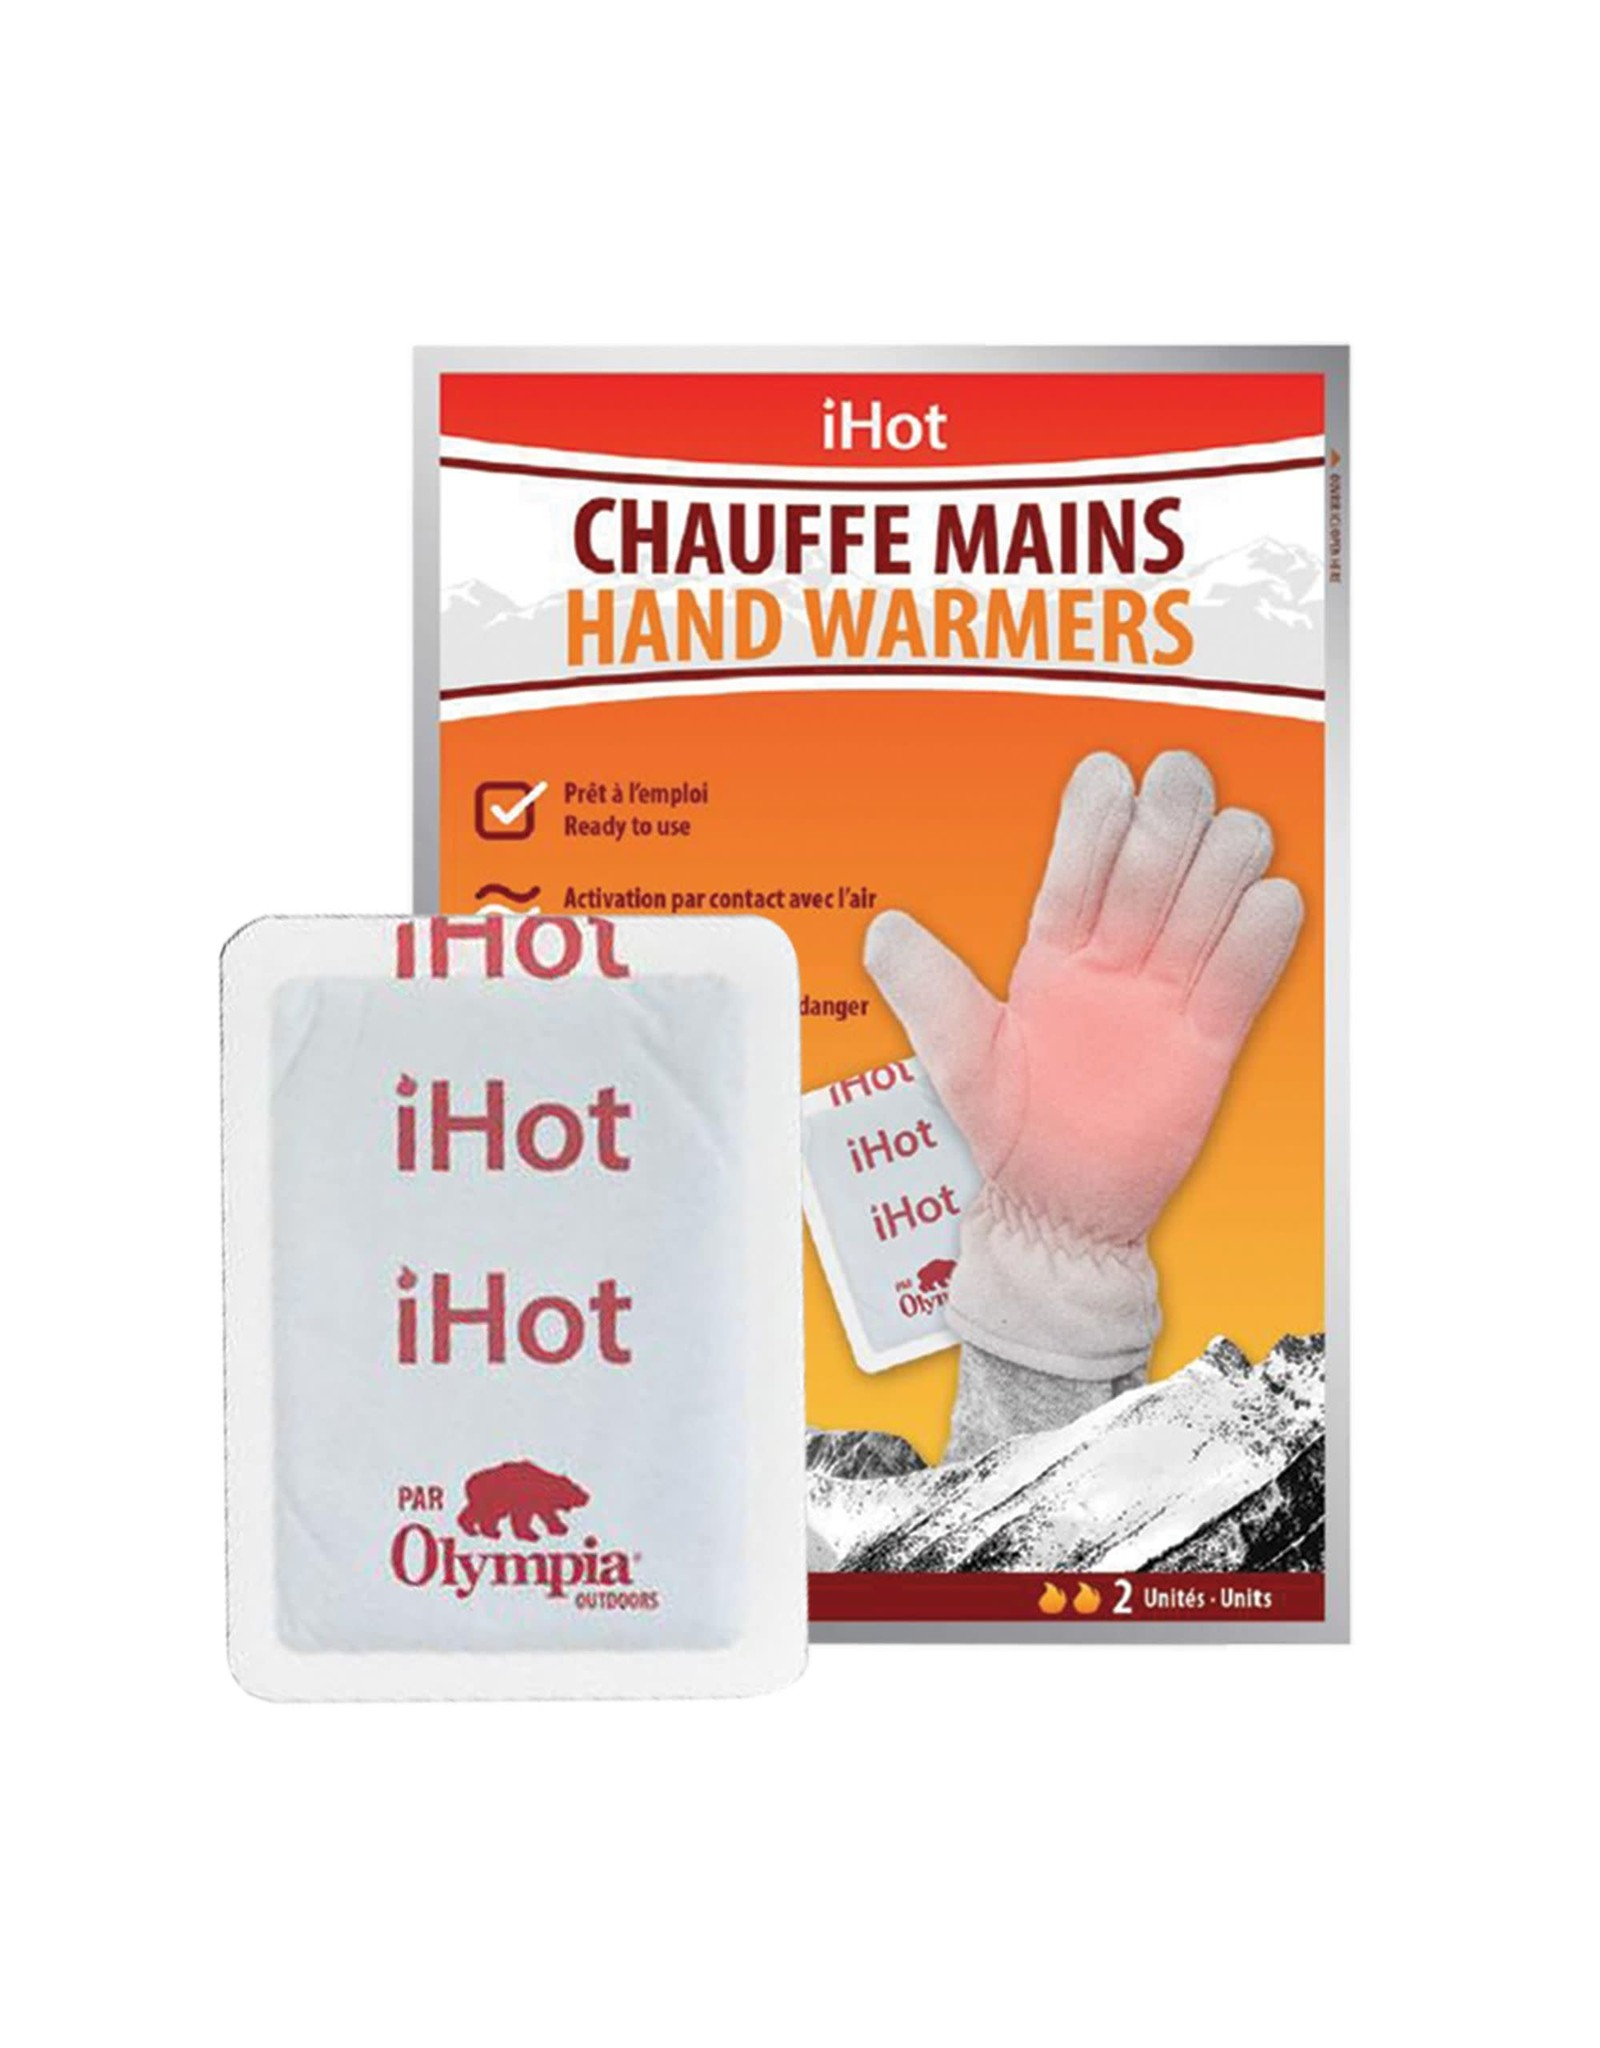 IHOT-CHAUFFE MAINS